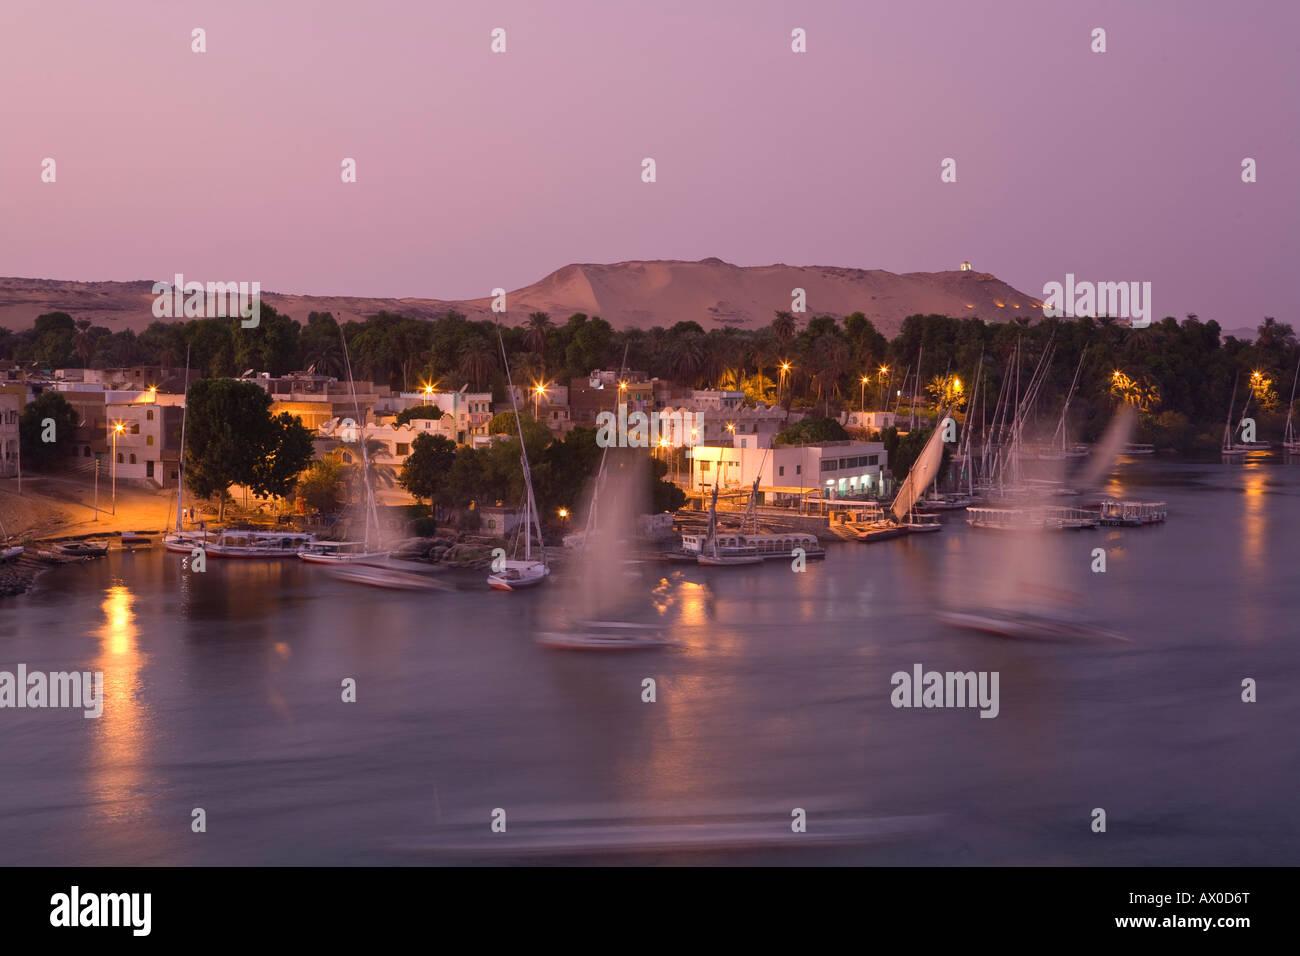 Feluccas on River Nile, Aswan, Egypt Stock Photo